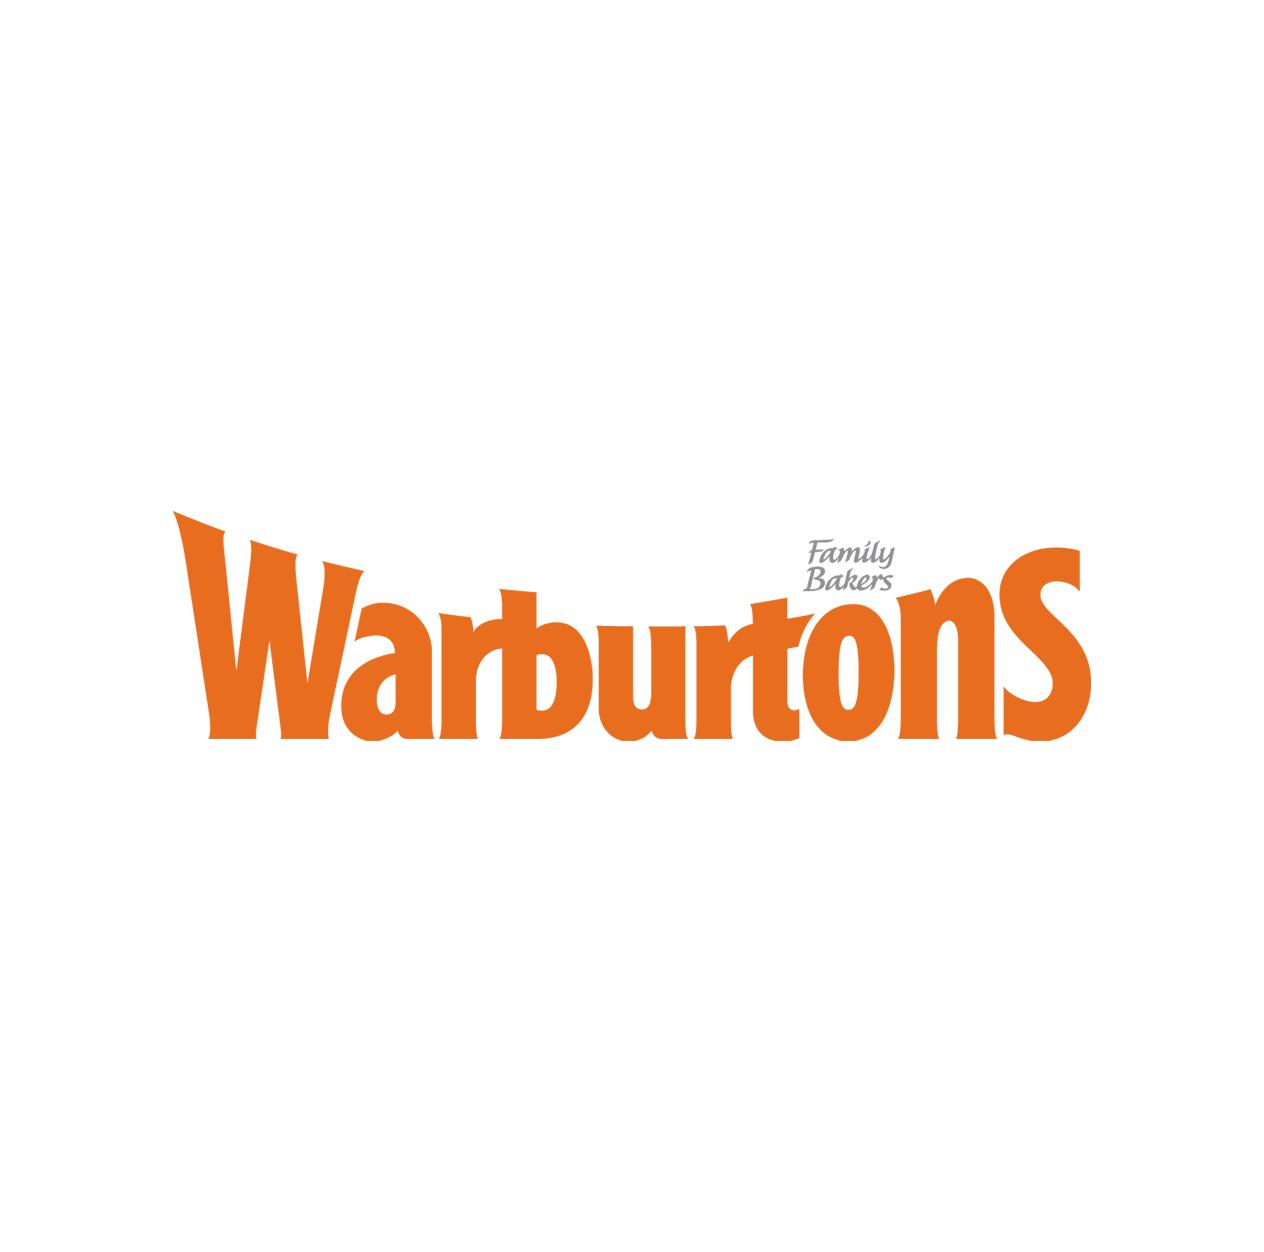 Warburtons (ccell).jpg